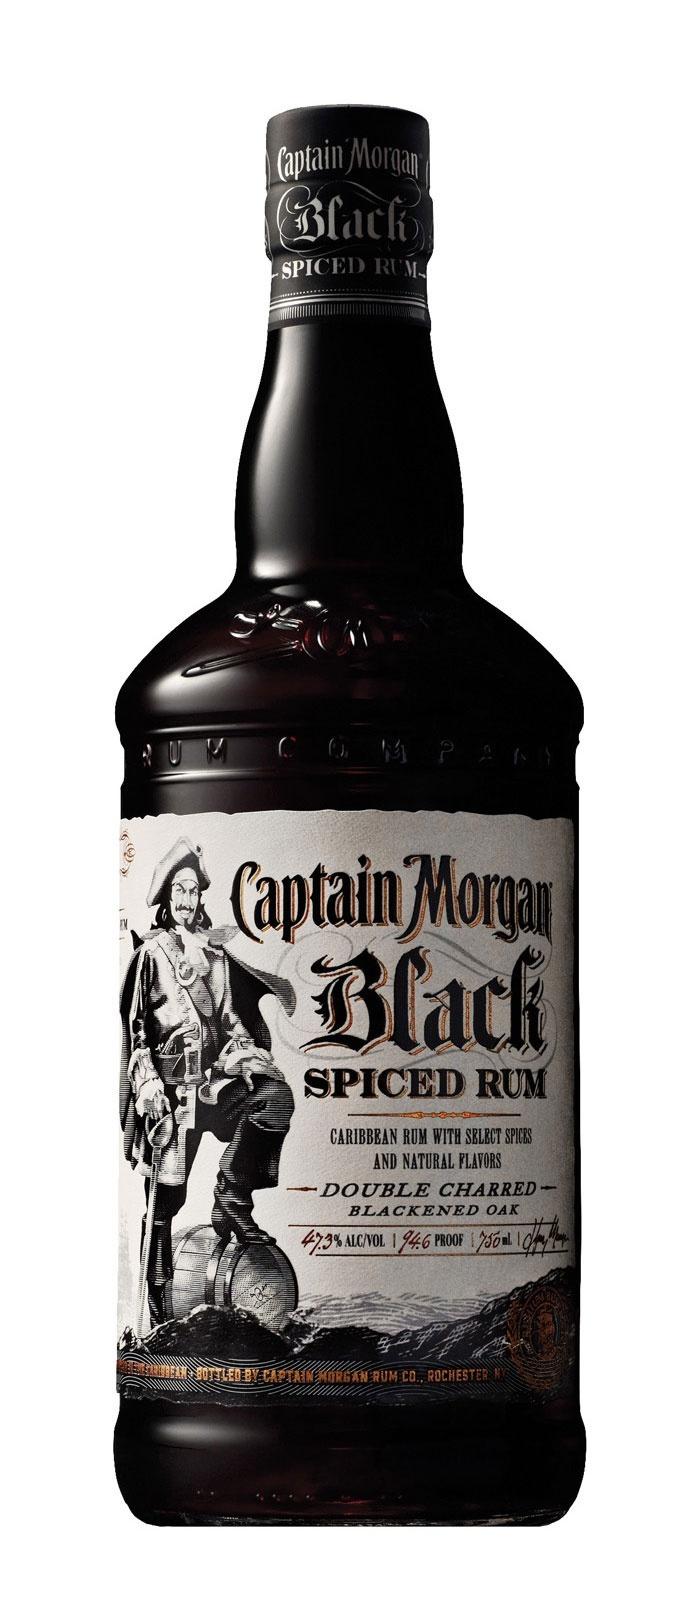 Captain Morgan Original BLack Spiced rum